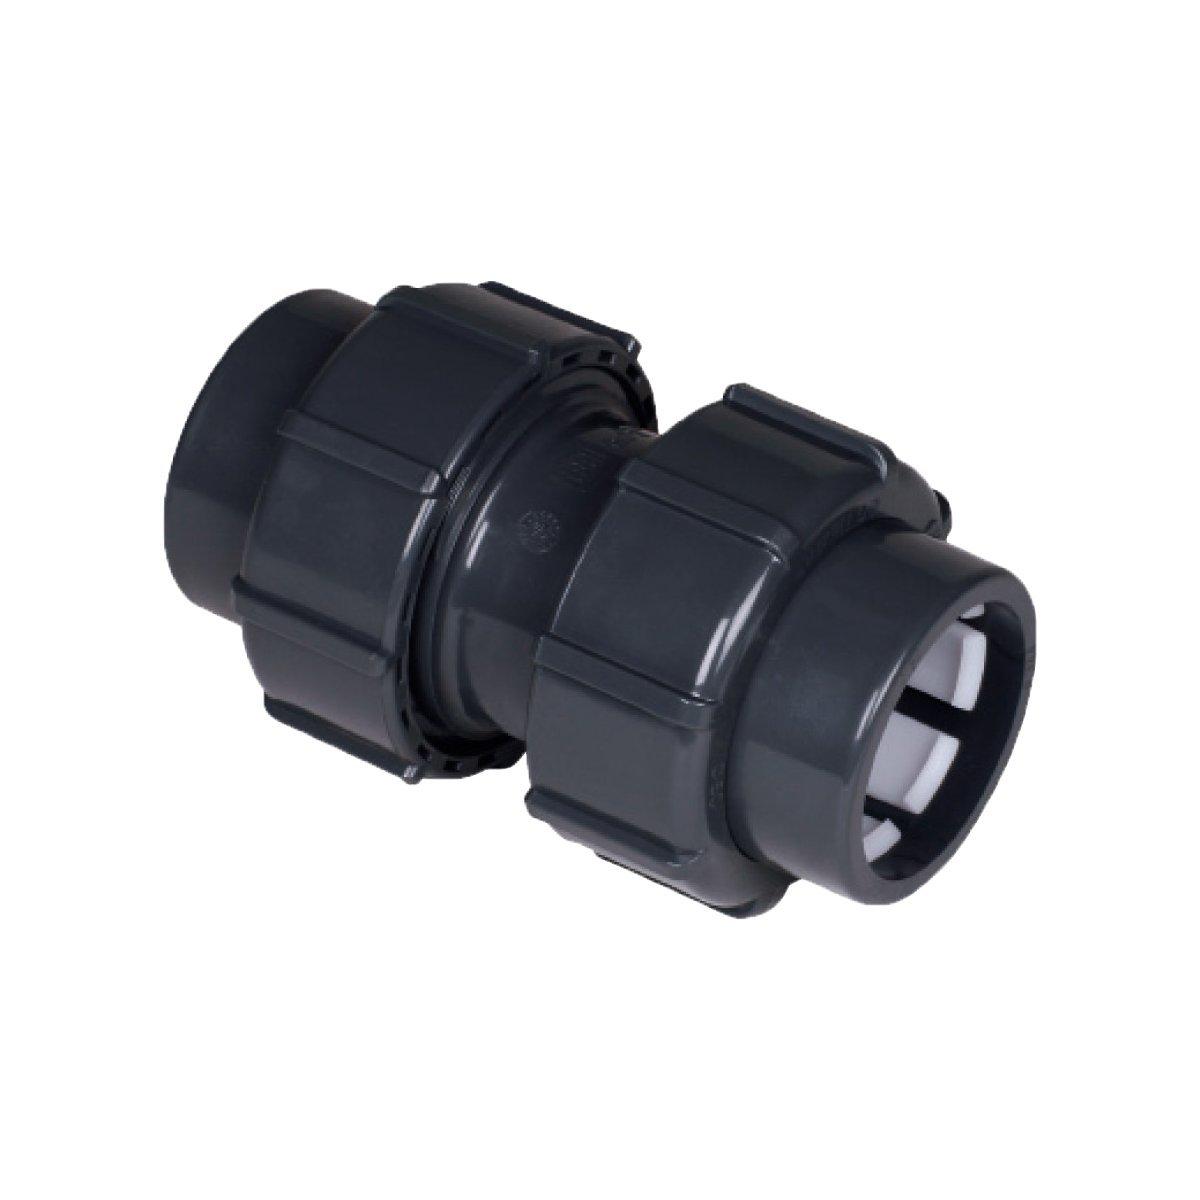 jardiboutique Manguito Tubo-Tubo empalmes compresi/ón di/ámetro 50/mm PN 16 /Empalme PVC Montaje r/ápido/